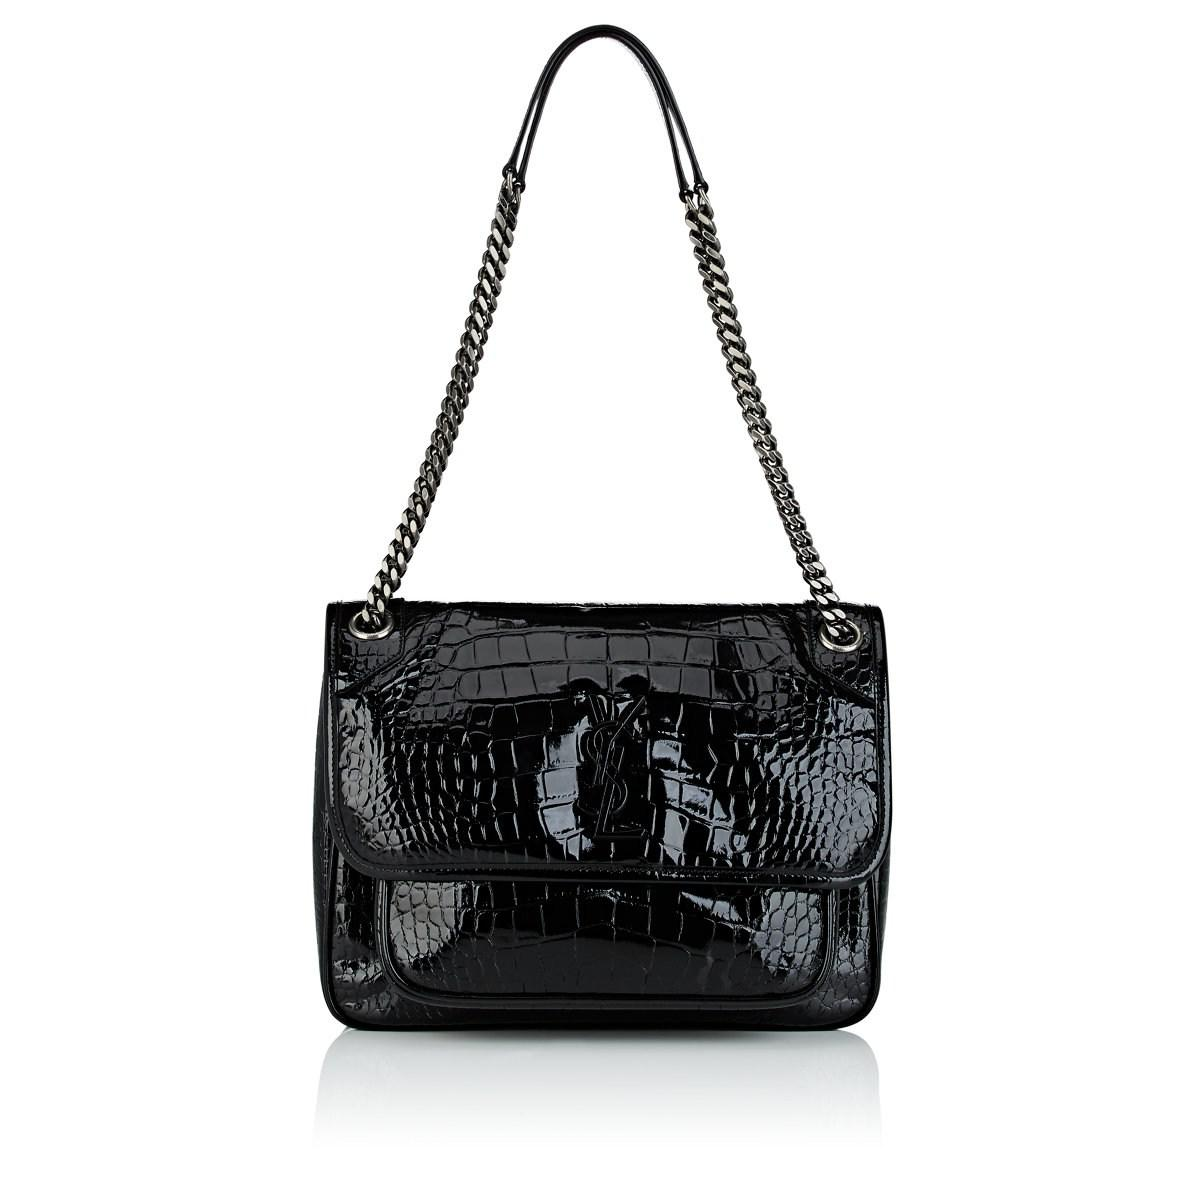 Saint Laurent Monogram Niki Medium Leather Shoulder Bag in Black - Lyst 7823636c70ded